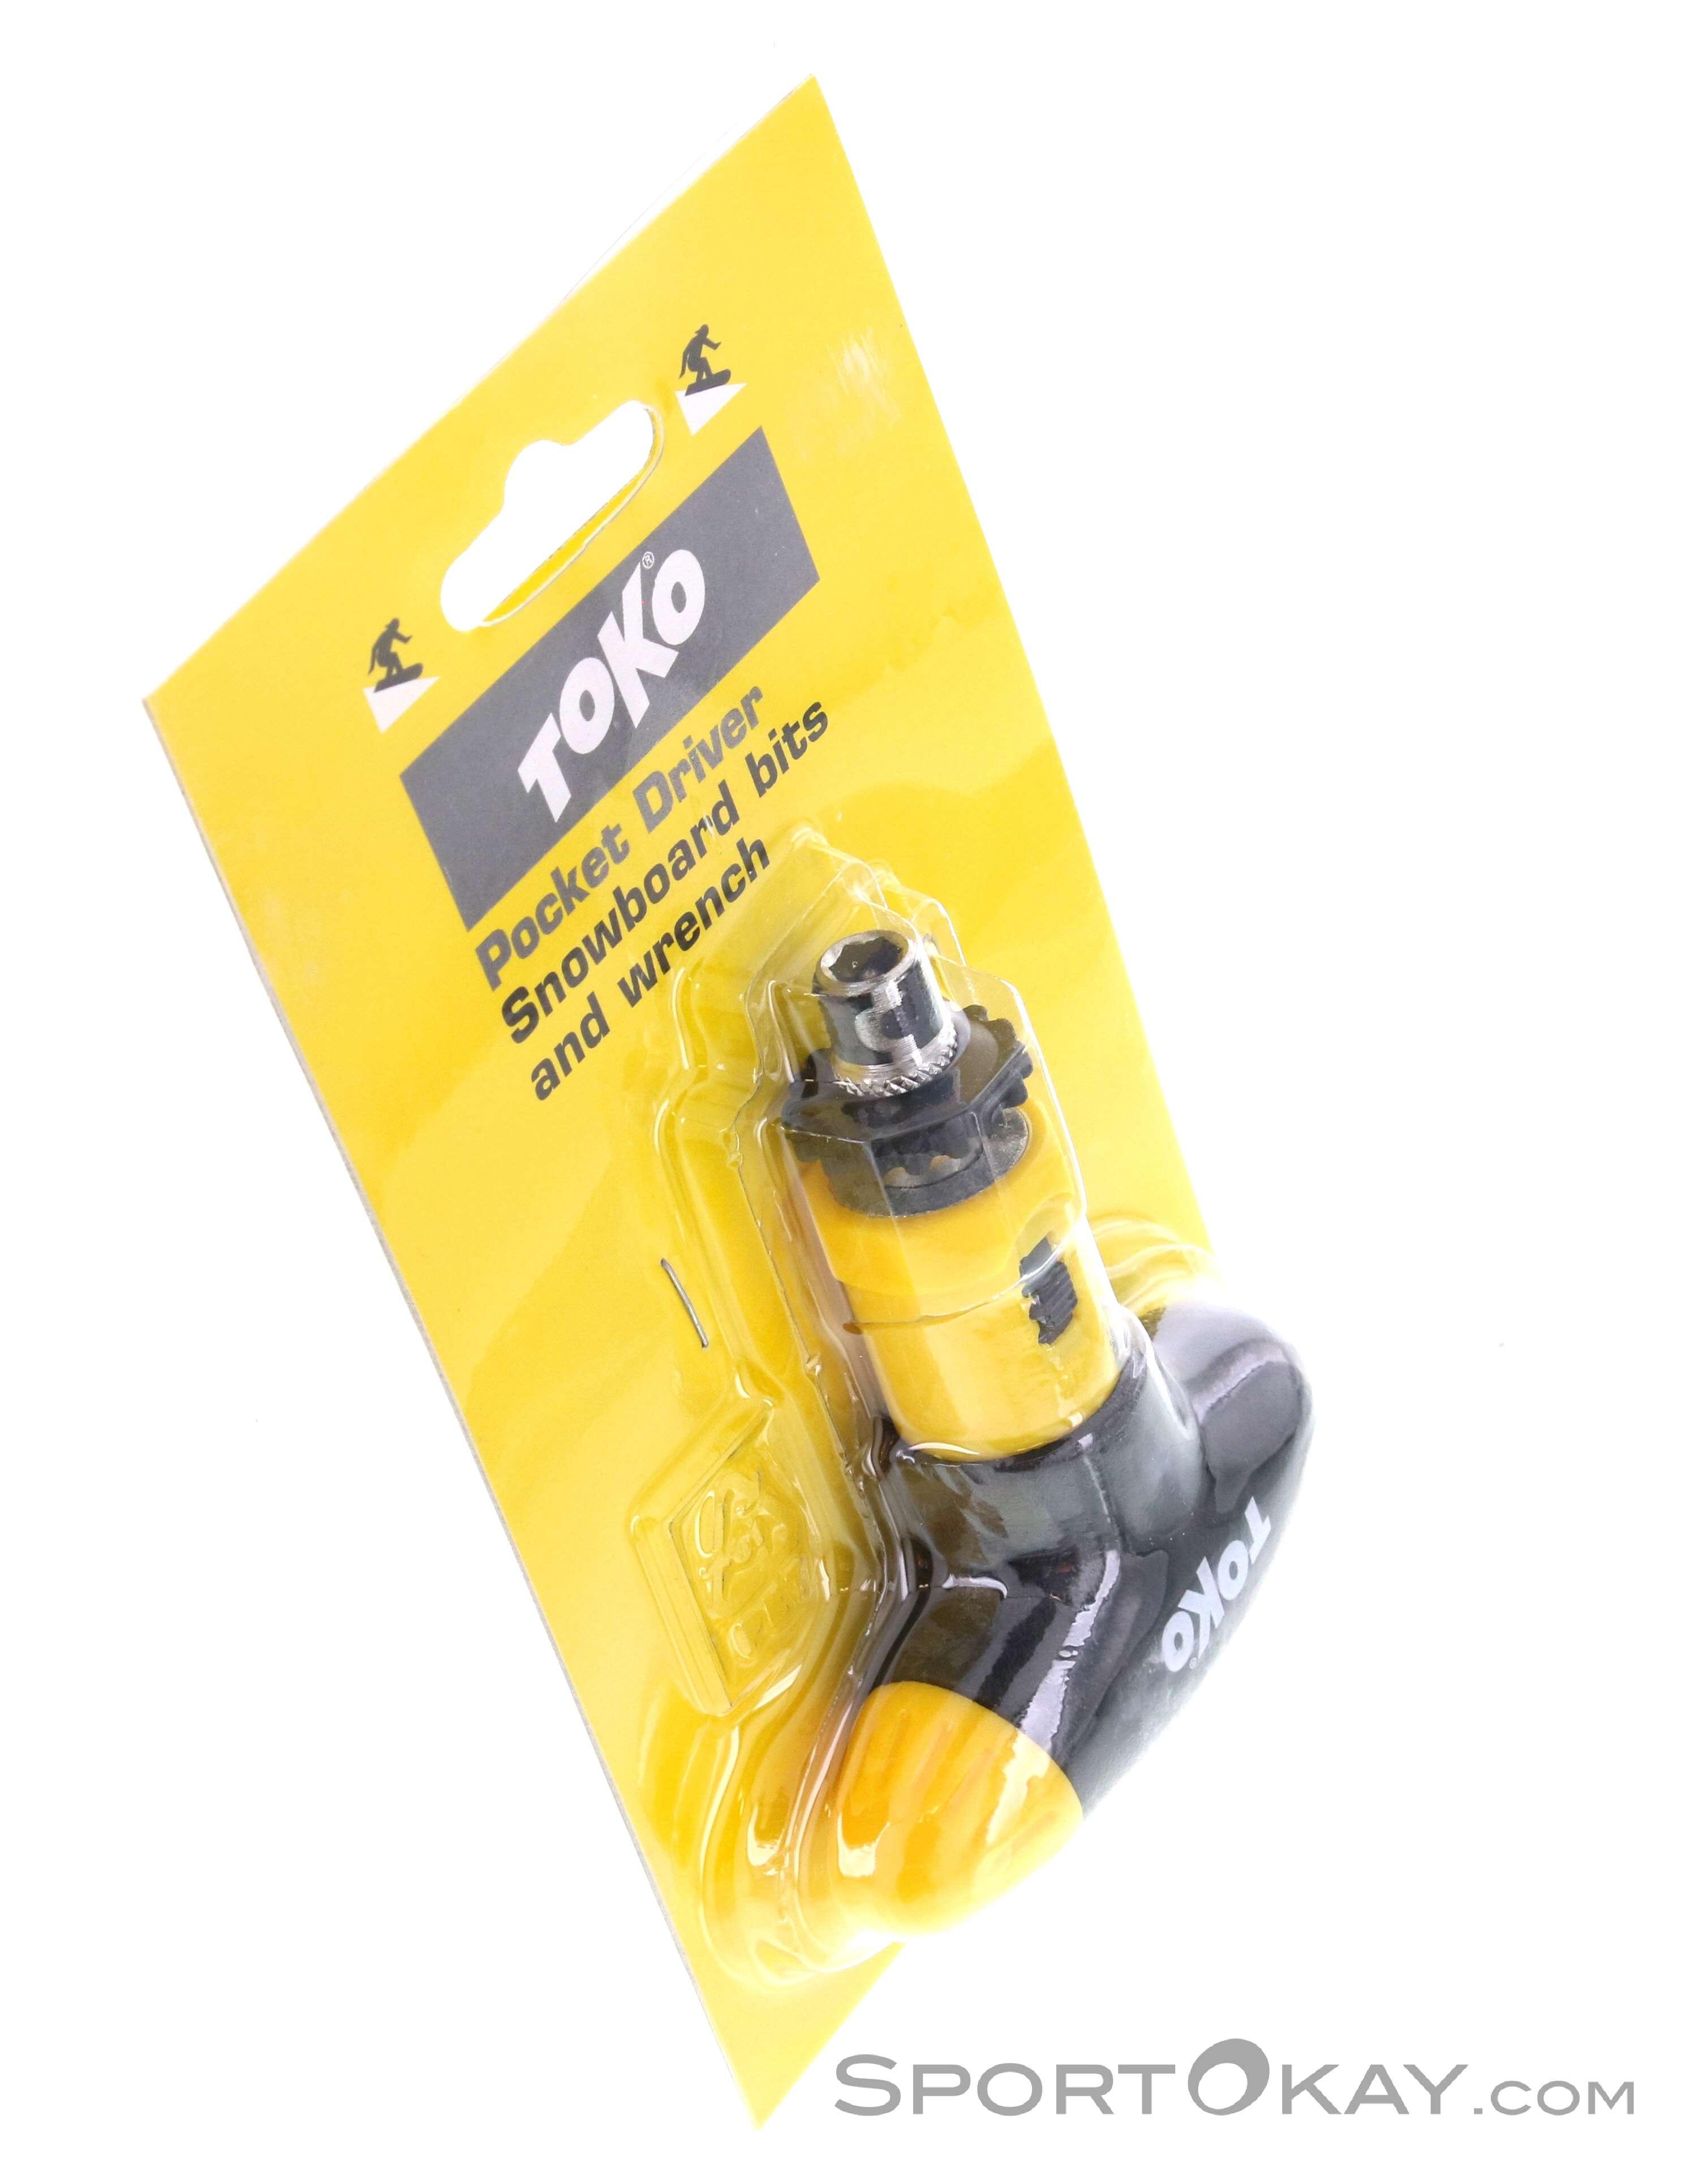 BRAKE PART OR8 DISC BOLTS-M5x10 TORX PK6 Bike Components & Parts Origin8 Disc Rotor Bolts